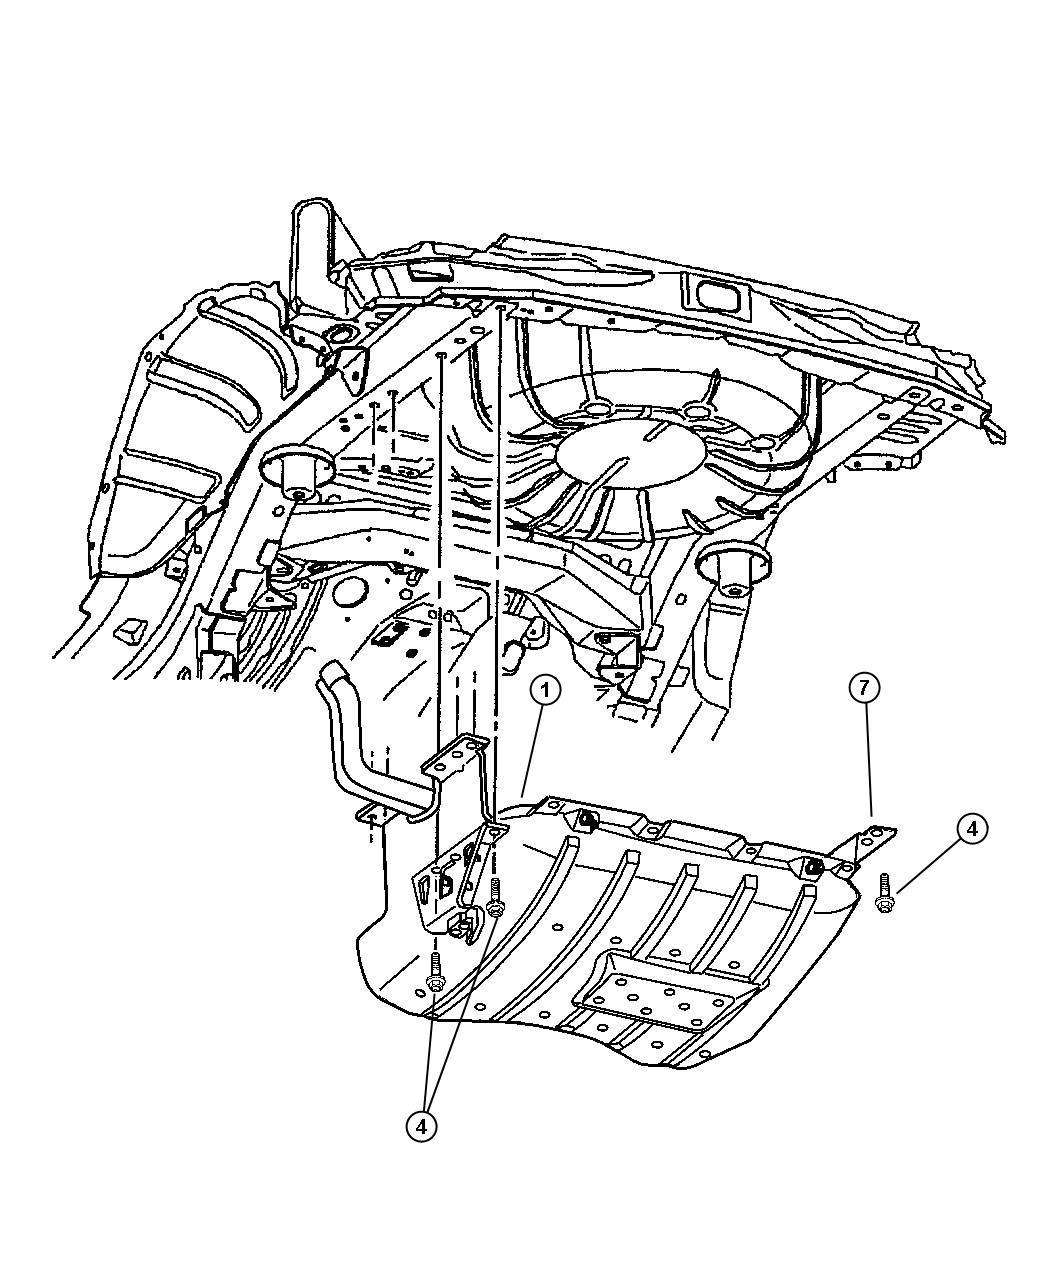 2001 Jeep Grand Cherokee Shield. Fuel tank. Evc, evaerhexa